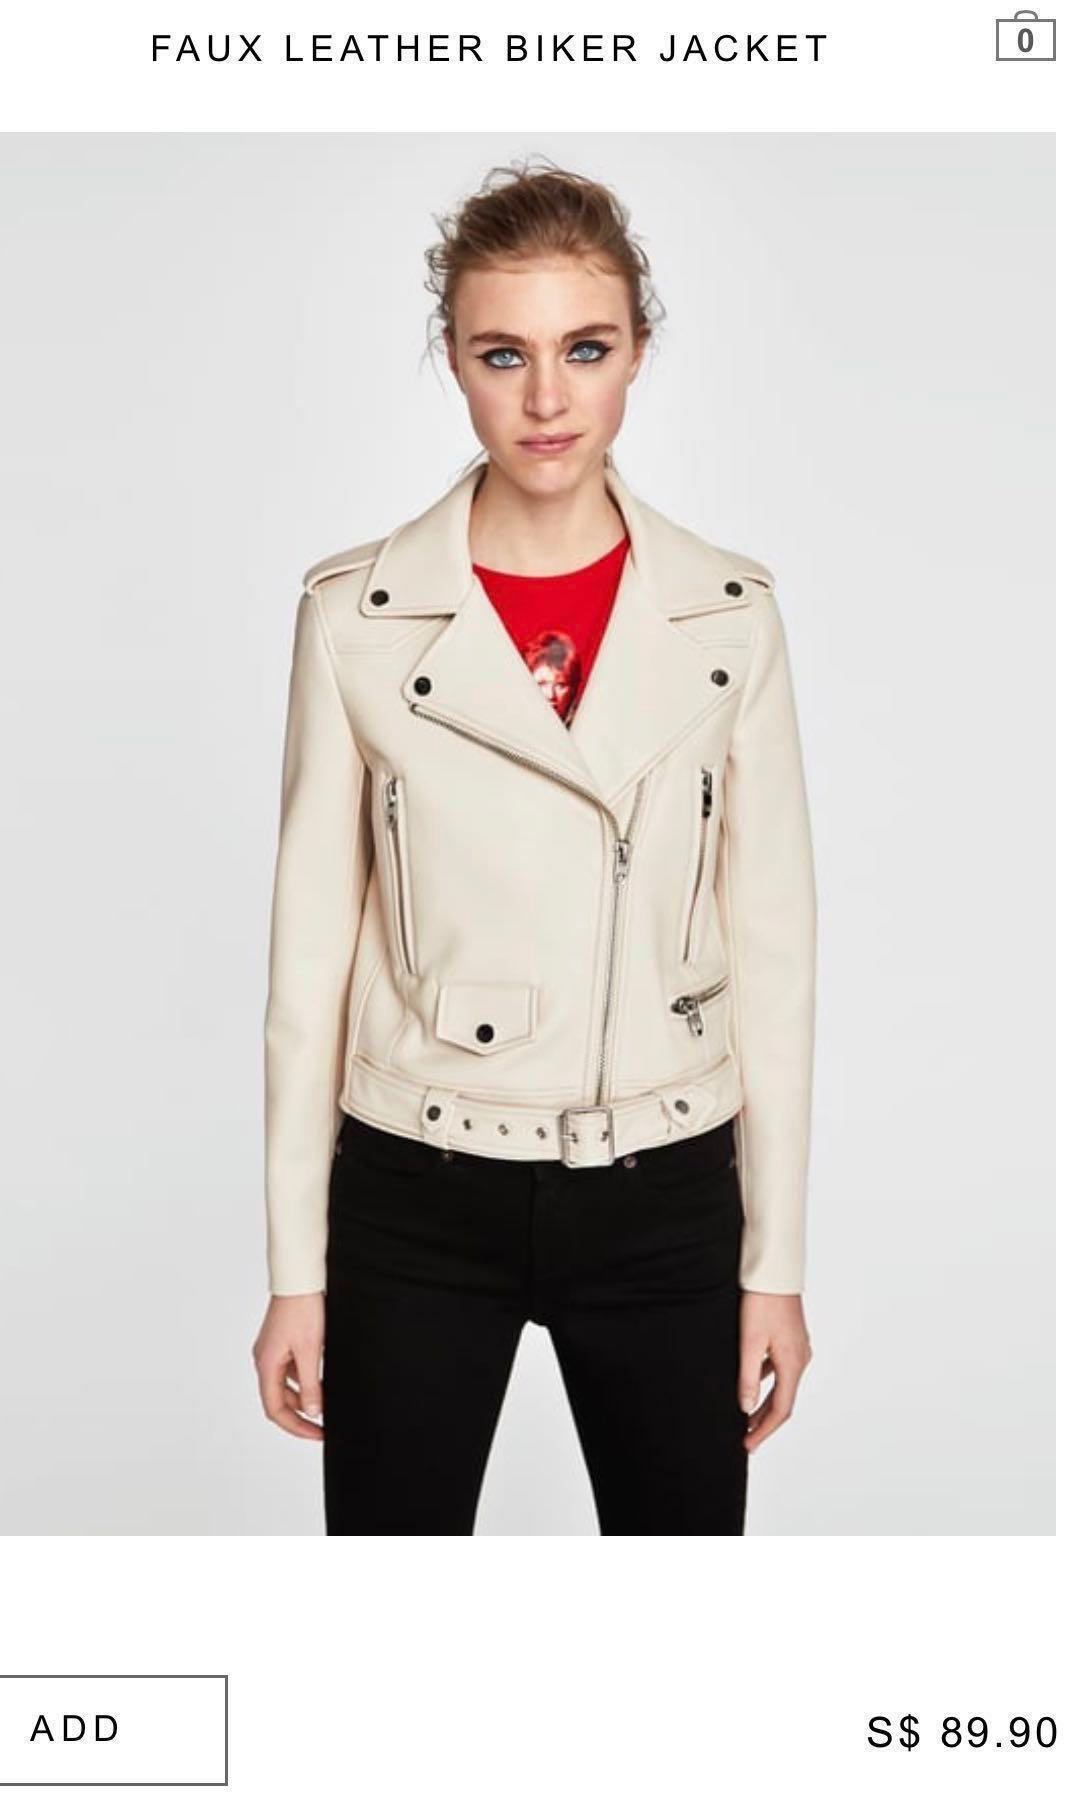 88eaf315b BNWOT Zara Faux leather biker jacket XS, Women's Fashion, Clothes ...